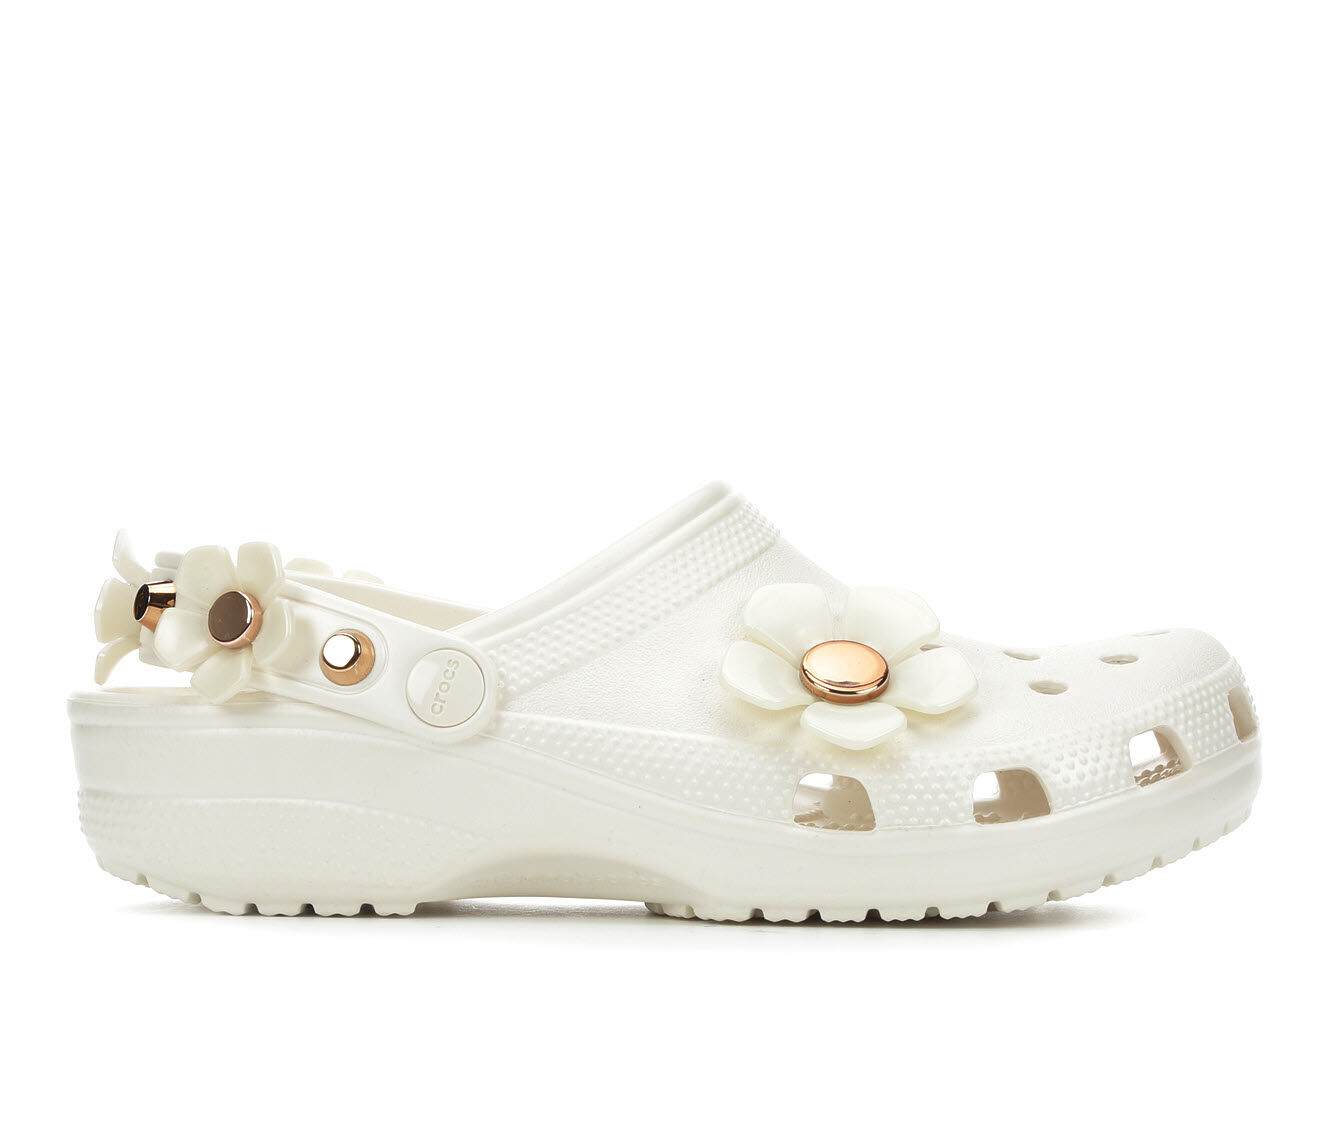 Last style Women's Crocs Classic Metallic Blooms Clogs Oyster